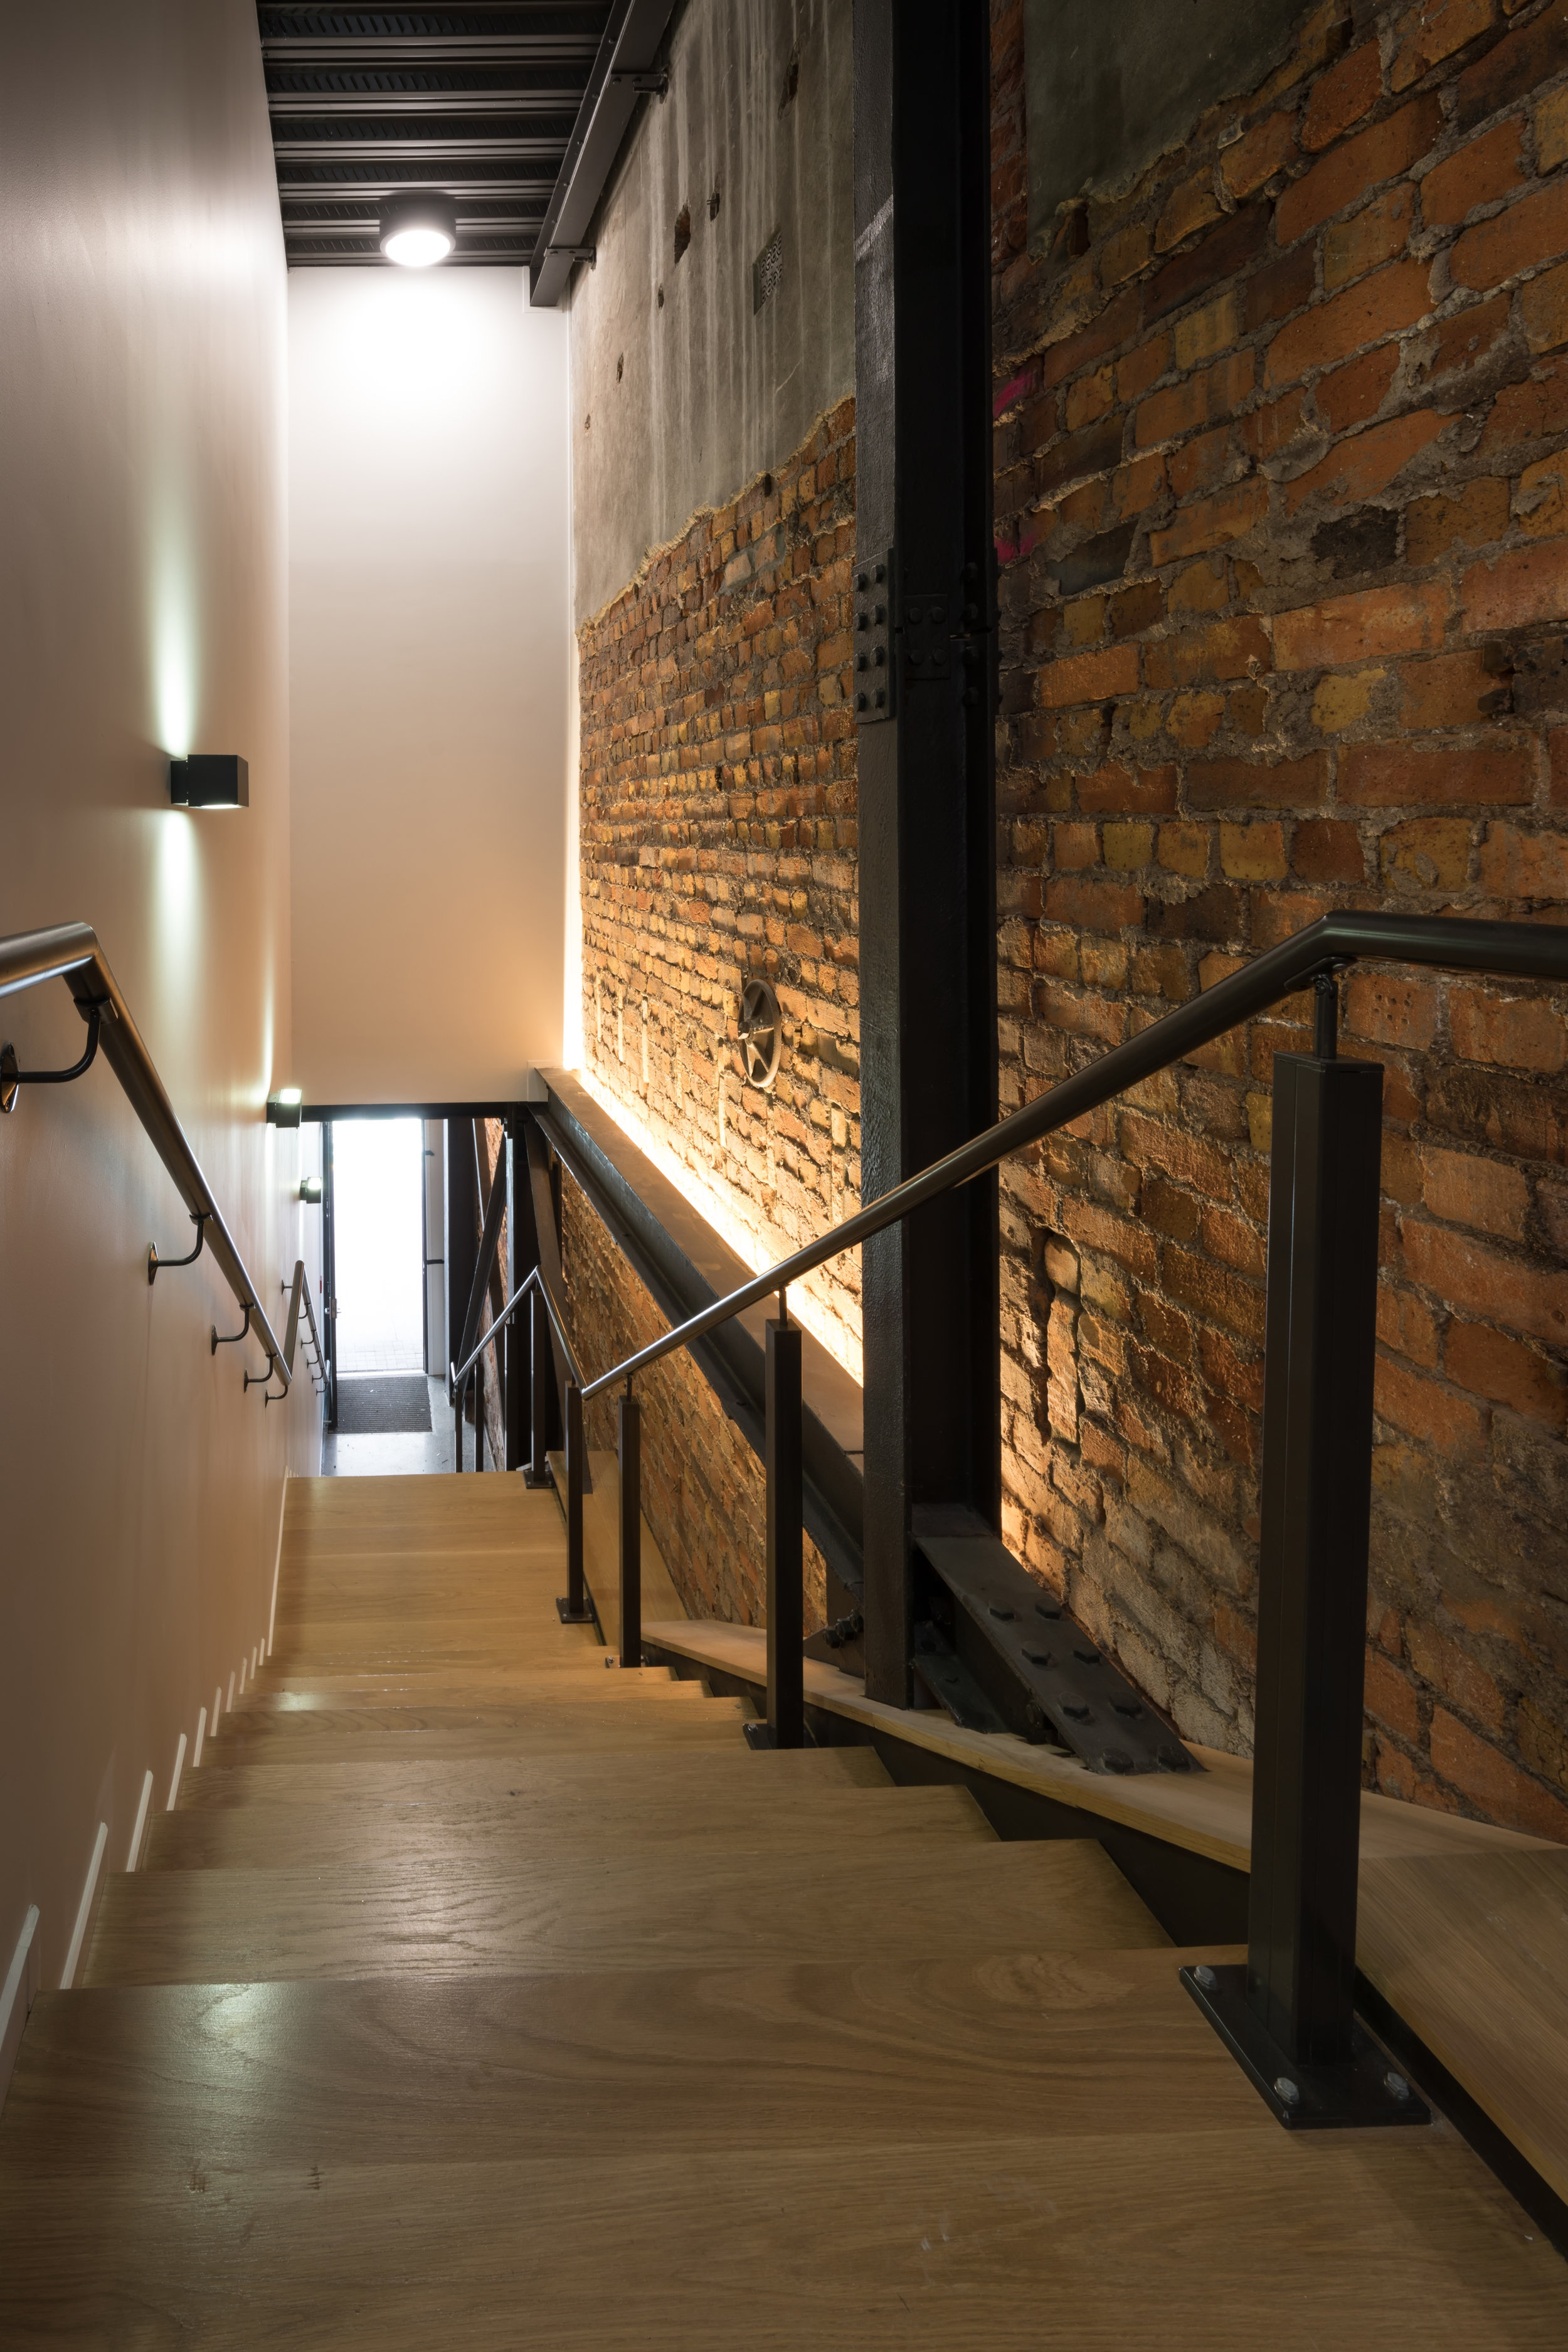 Industrial Stairs 94-96 Queen Street